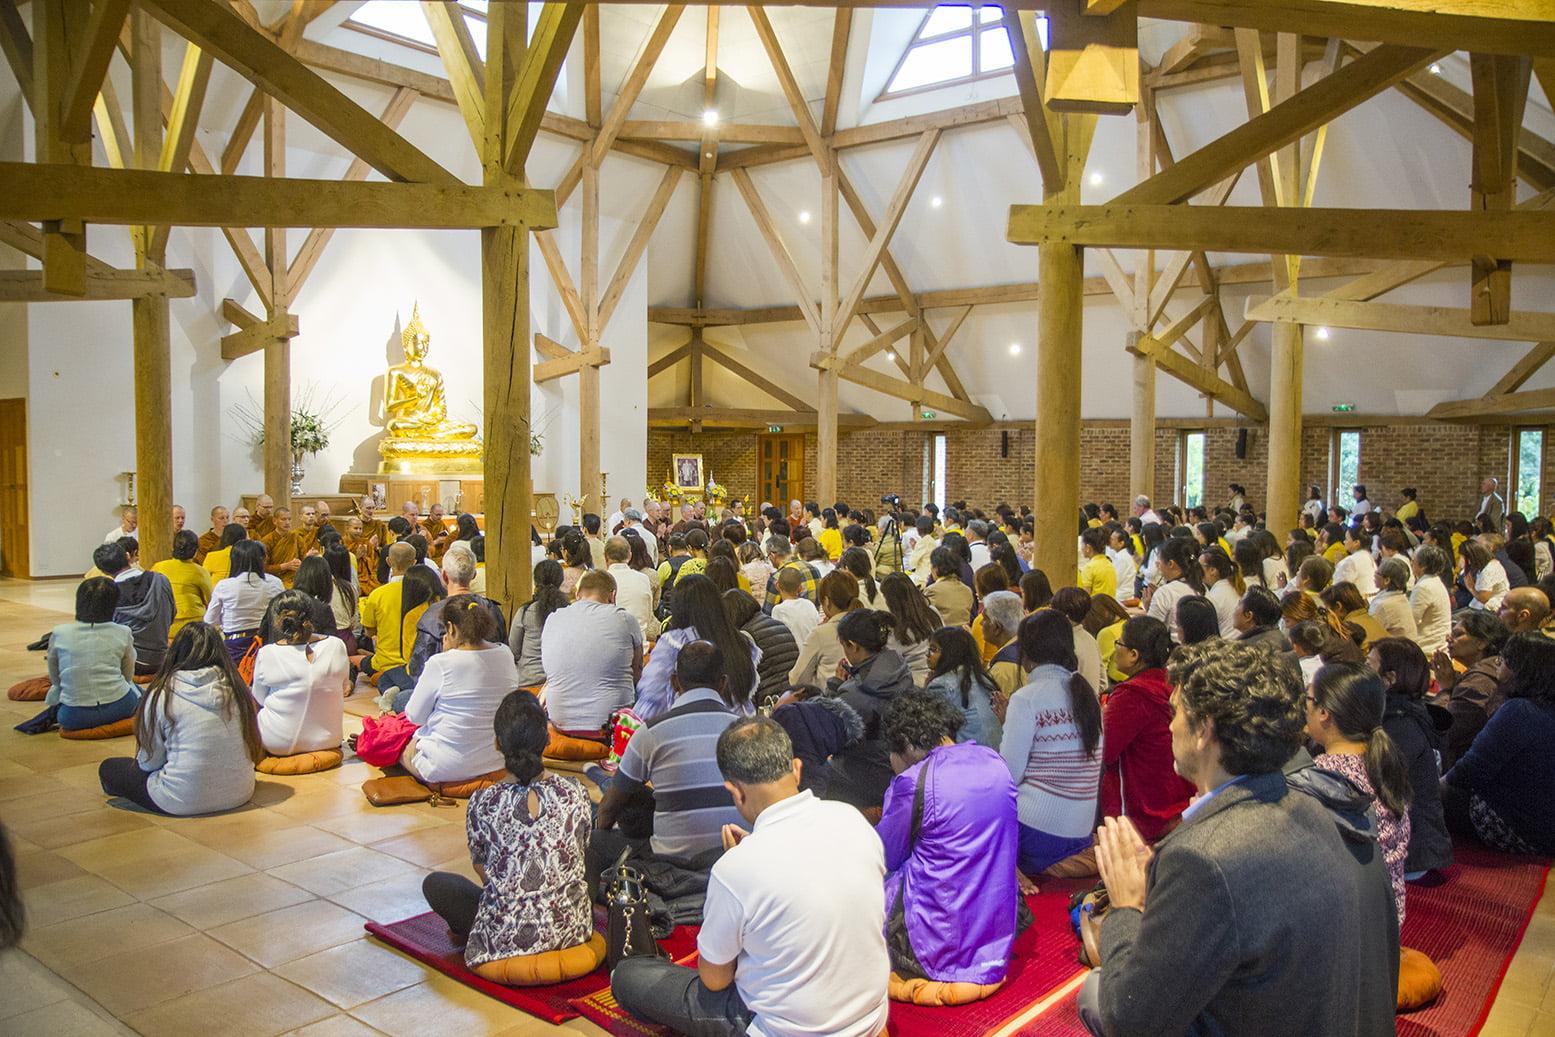 2018.10.17 Thai King's Birthday Celebration